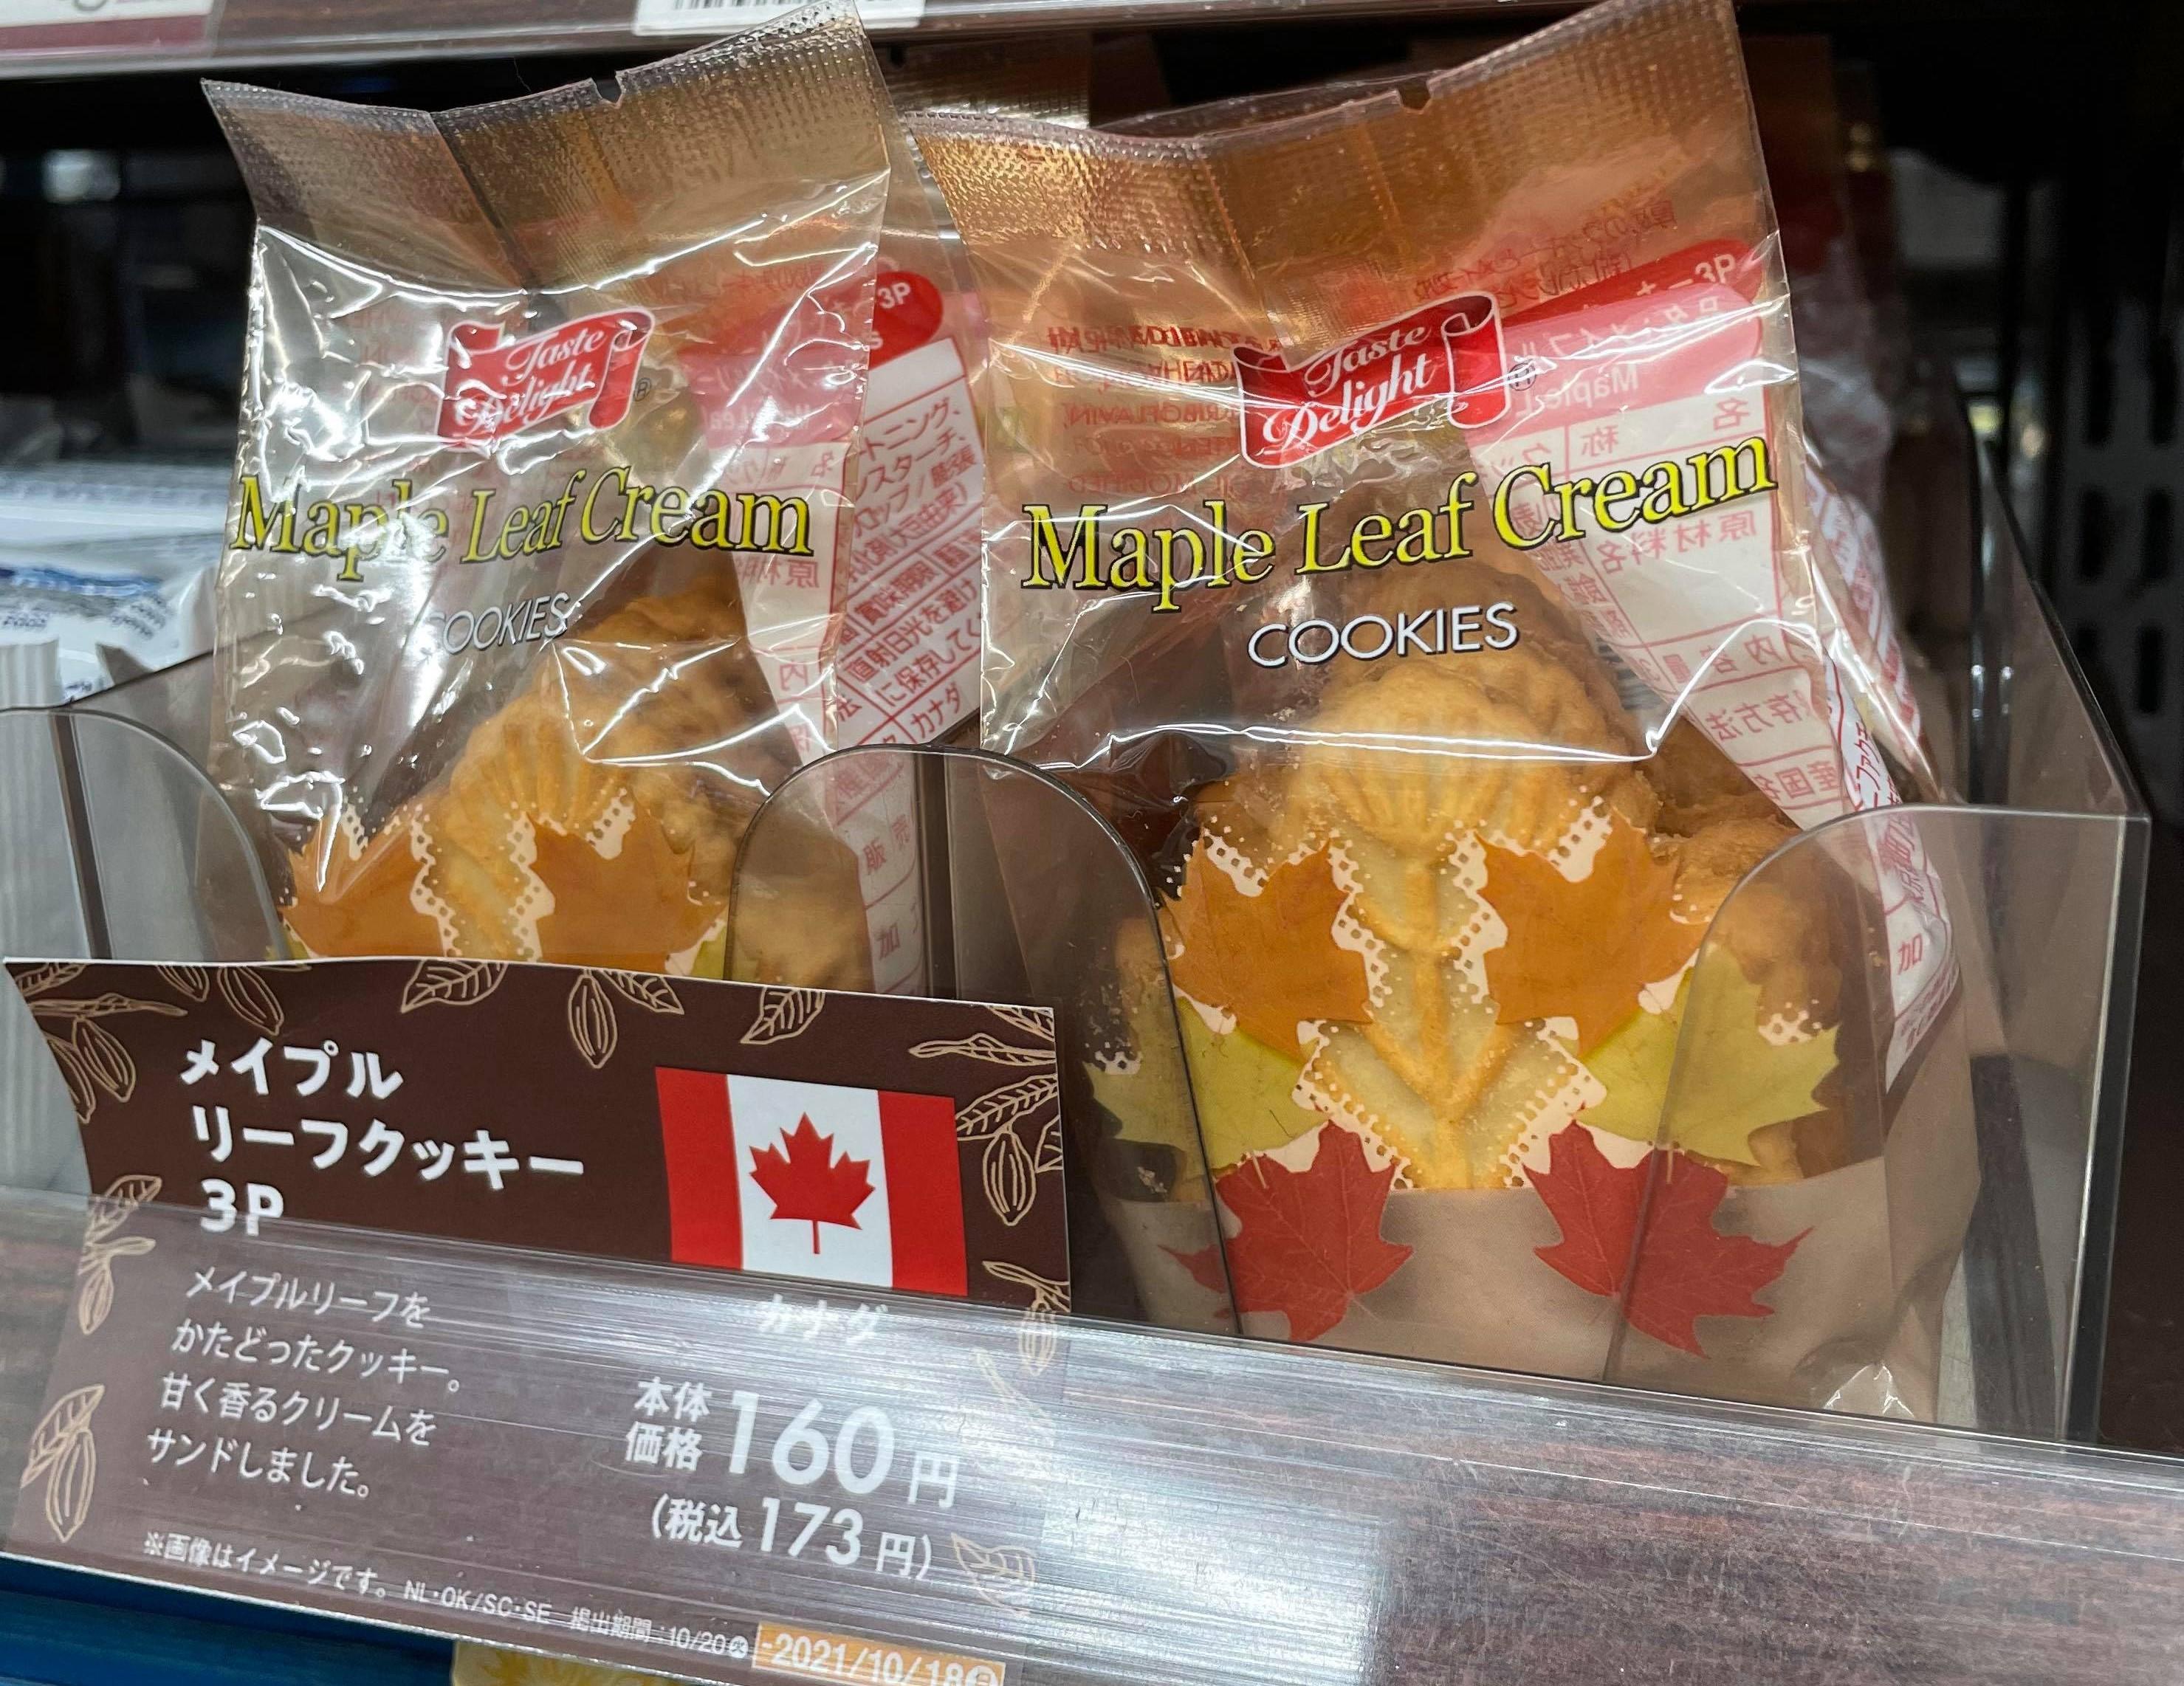 Taste Delight Maple Leaf Cream Cookies Natural Lawson